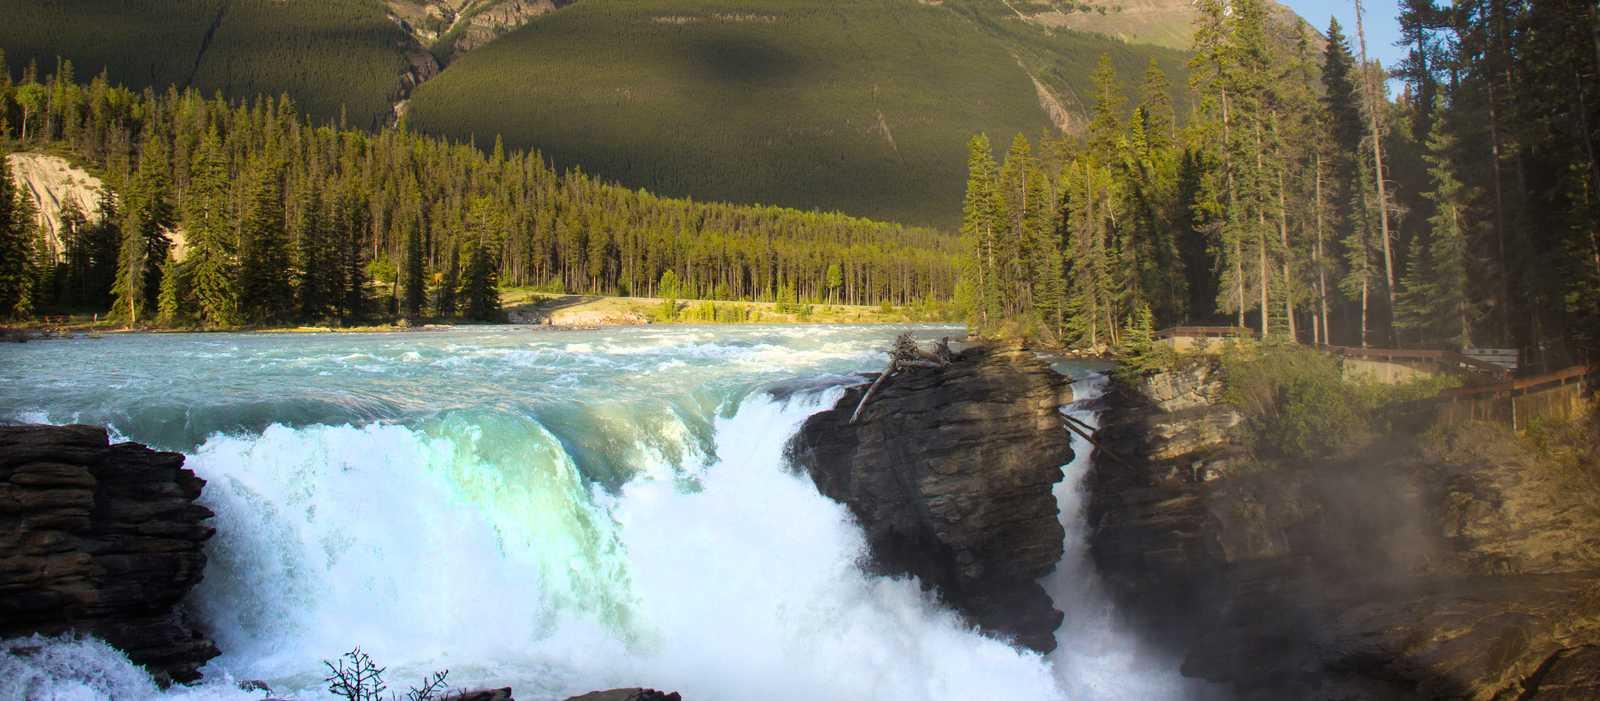 Impression Jasper National Park Parks Canada